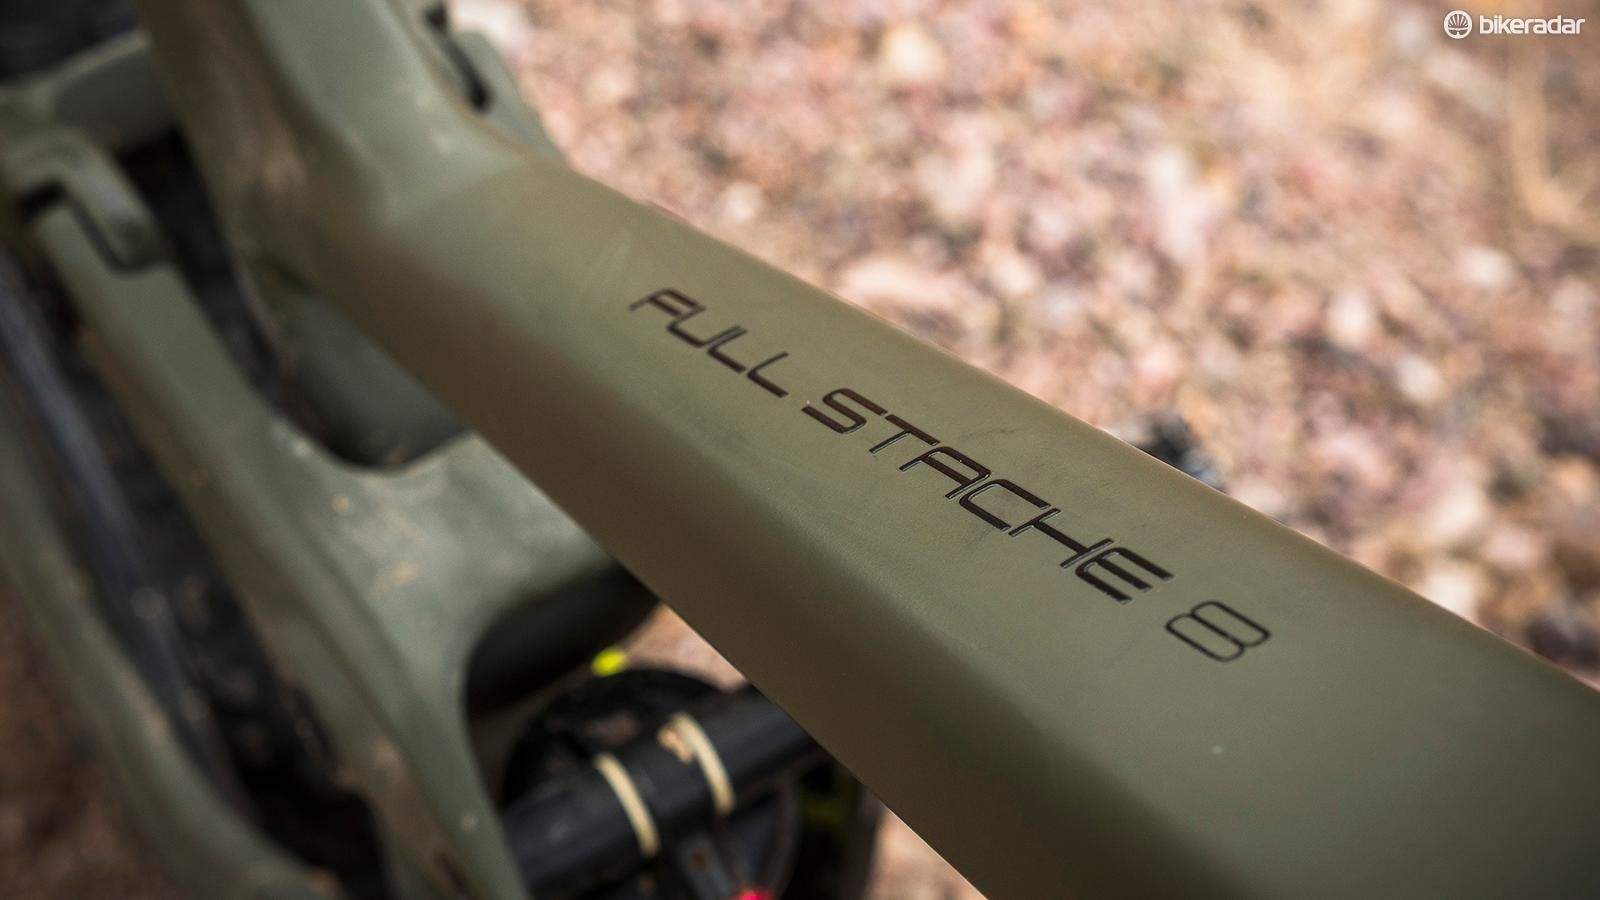 ddac0d8c4d9 Trek's Full Stache is a new take on the trail bike - BikeRadar